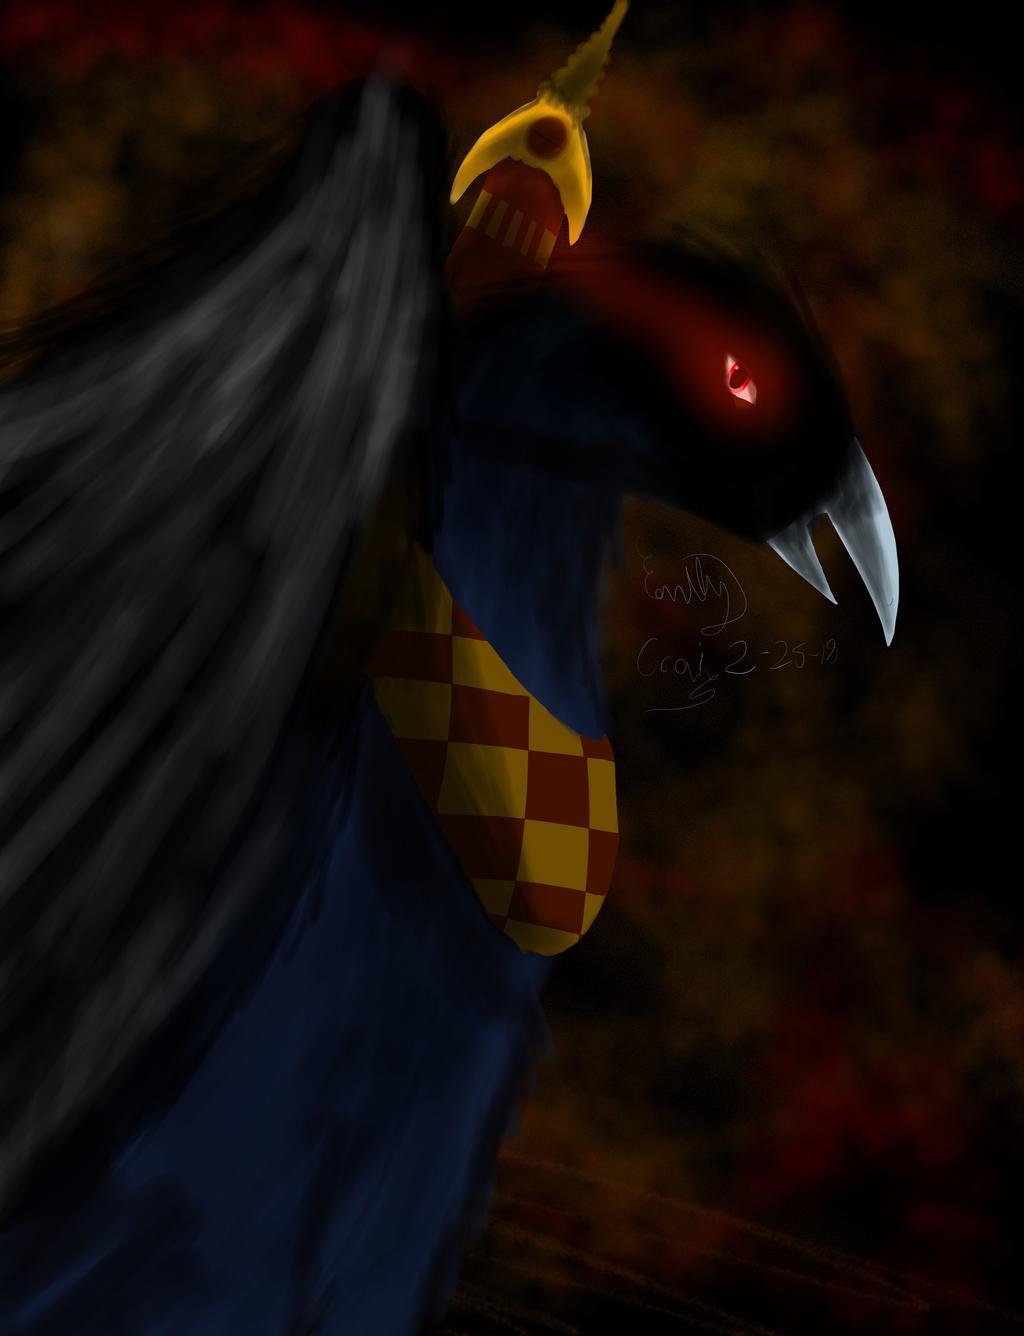 Black Demon by GhostDragon64